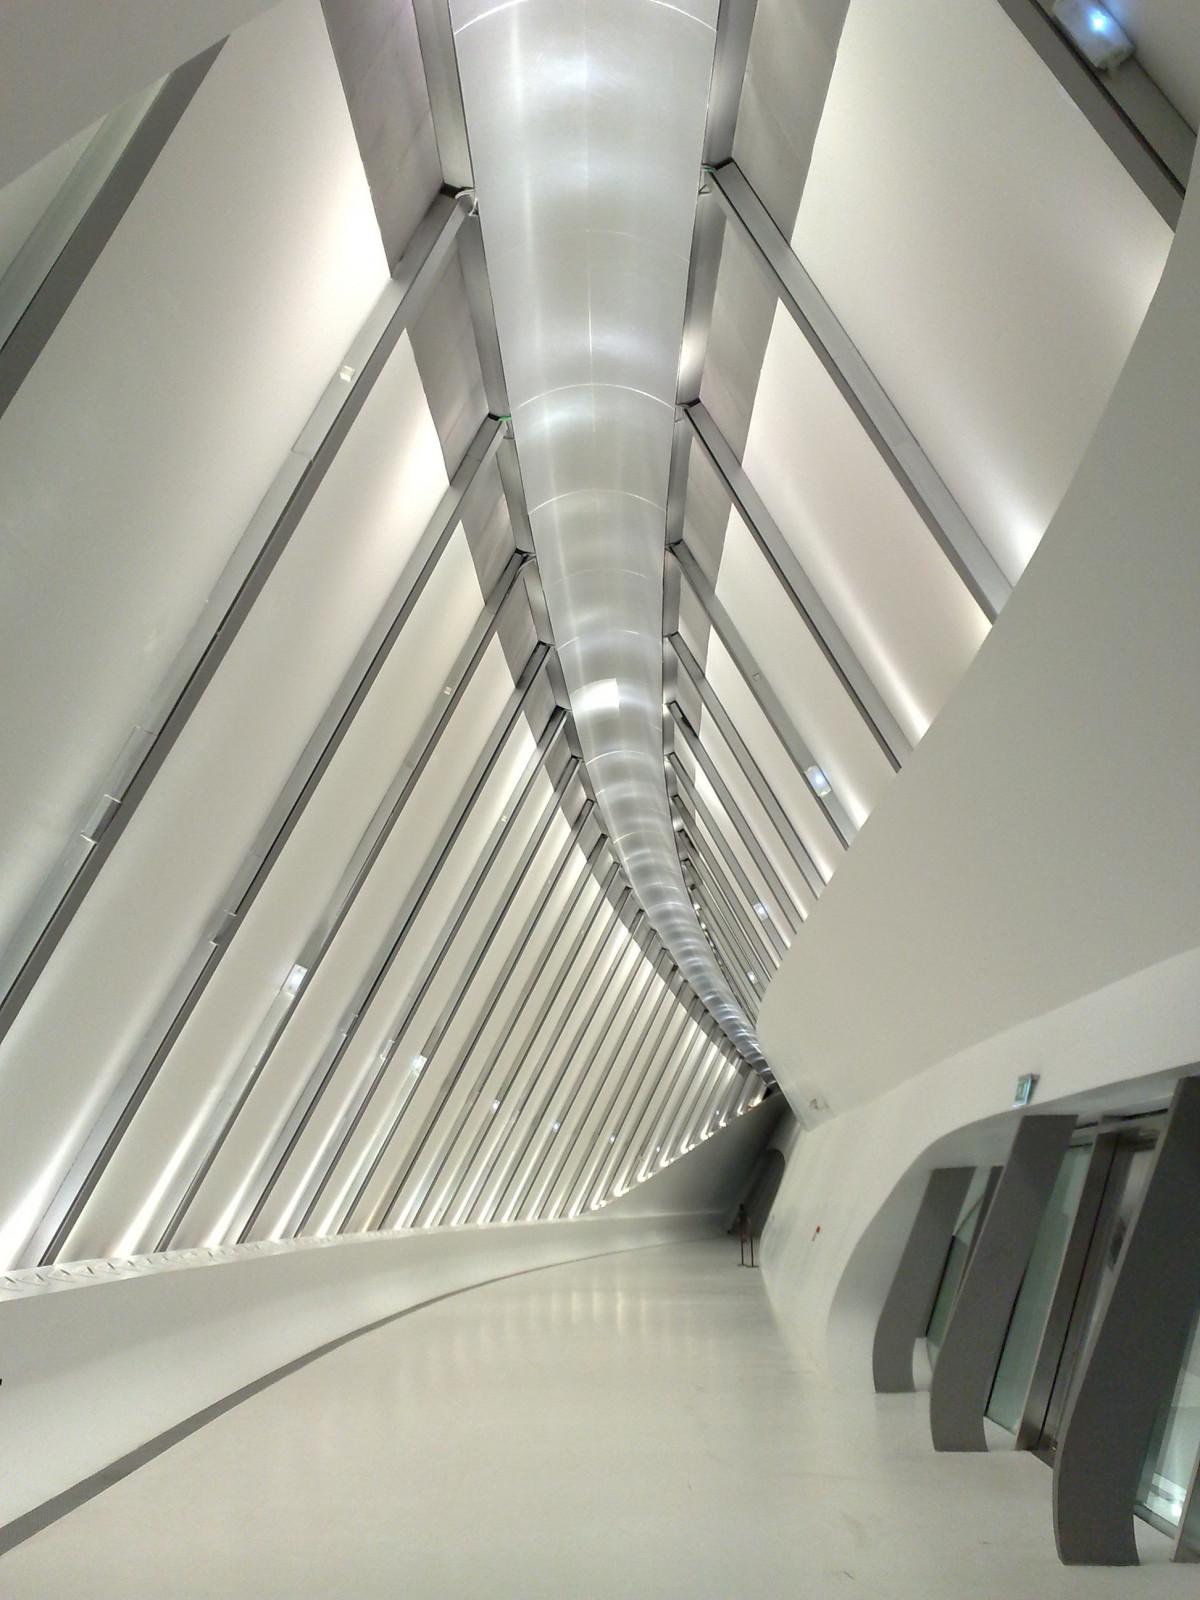 Architecture Interior Design Company In India: Free Images : Pathway, Architecture, White, Tunnel